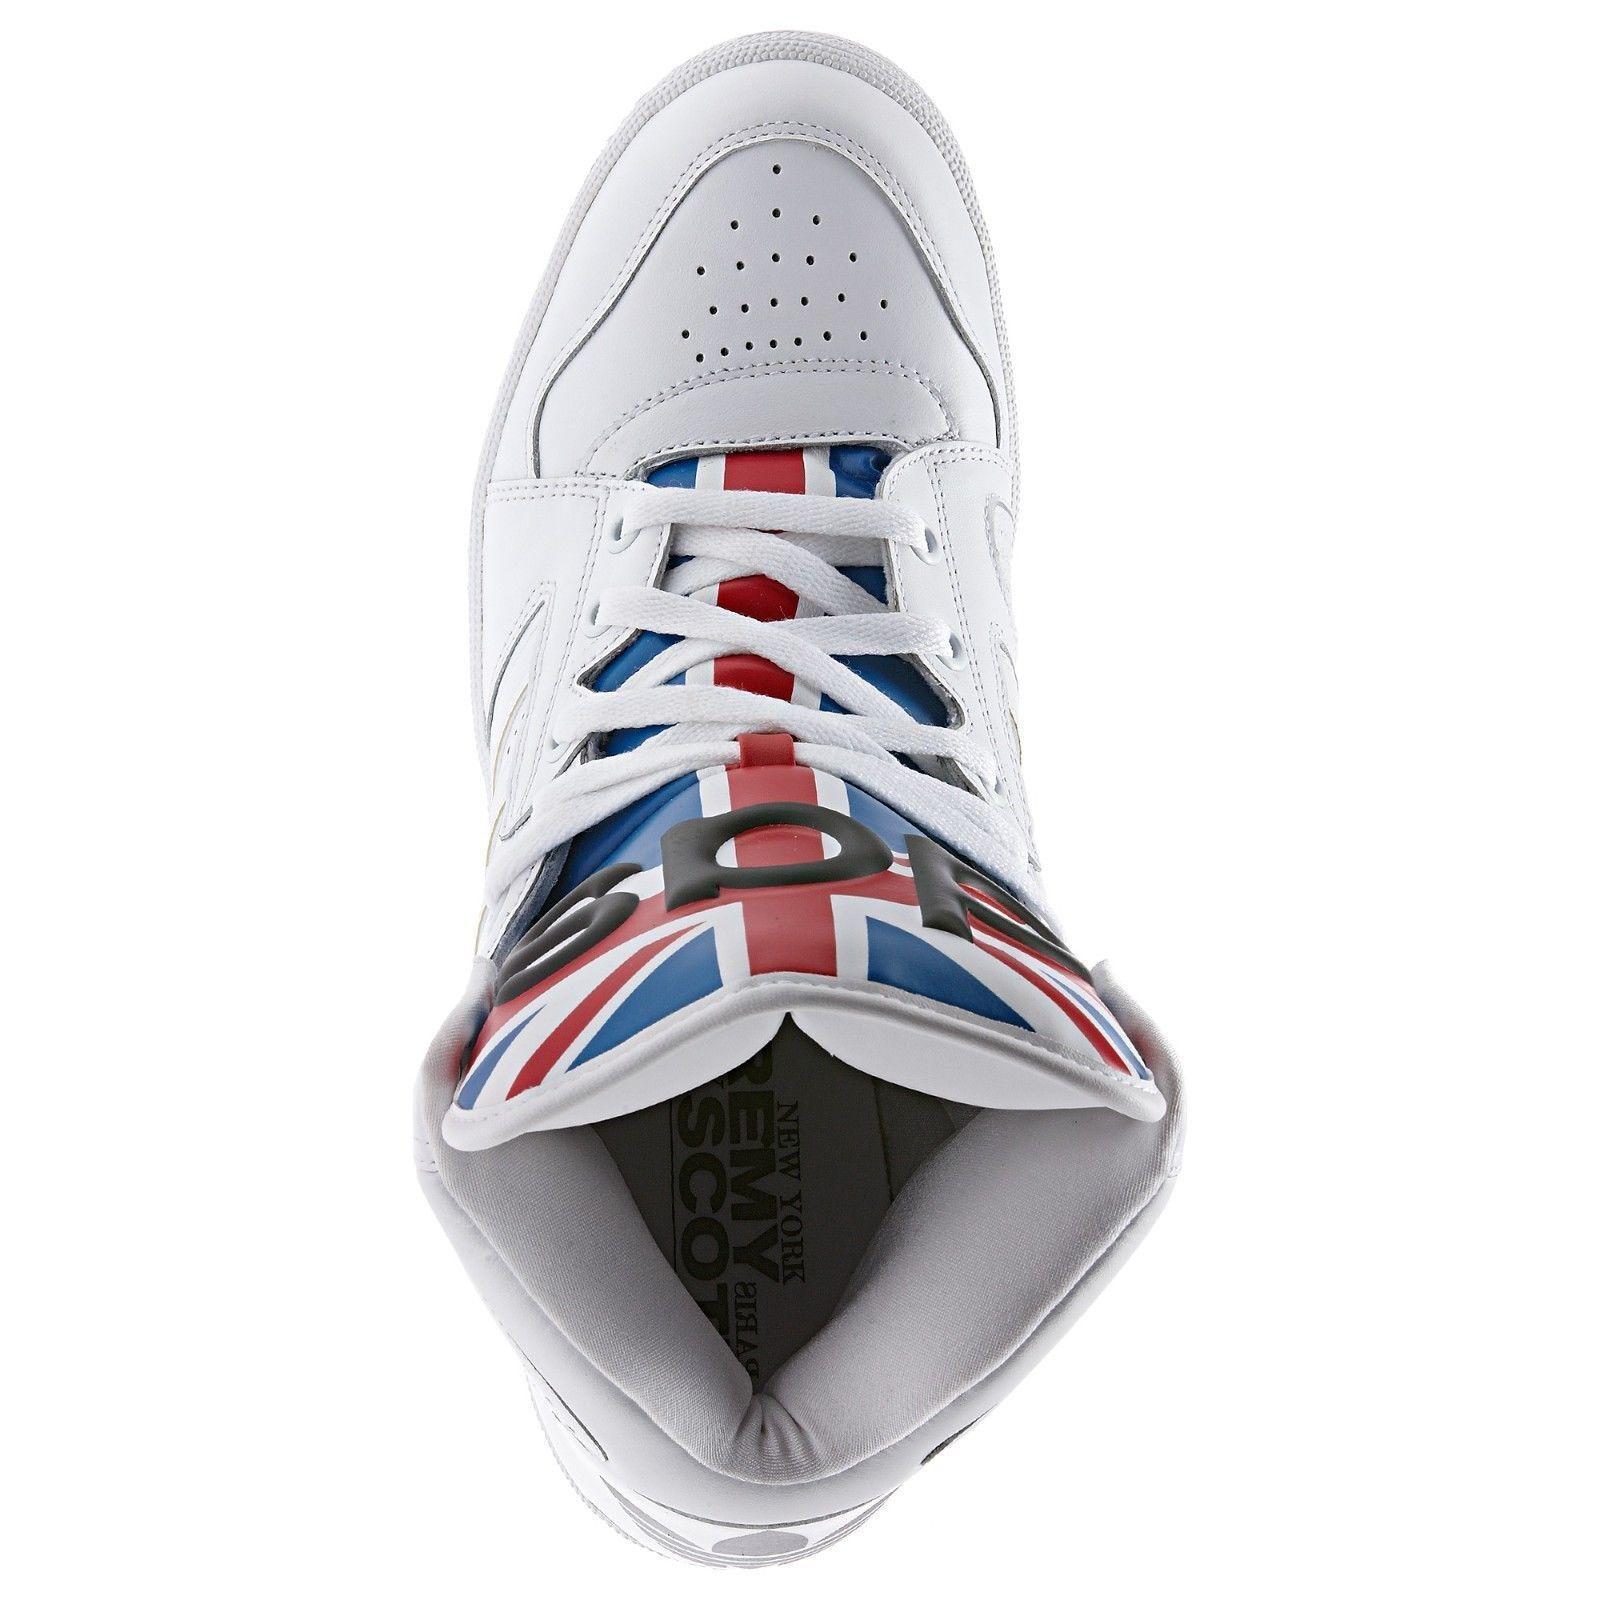 669b39b95aee ... Adidas Adidas Adidas Originals Men s Jeremy Scott Instinct Hi Union  Shoes Sizes 4.5 us D65204 81da33